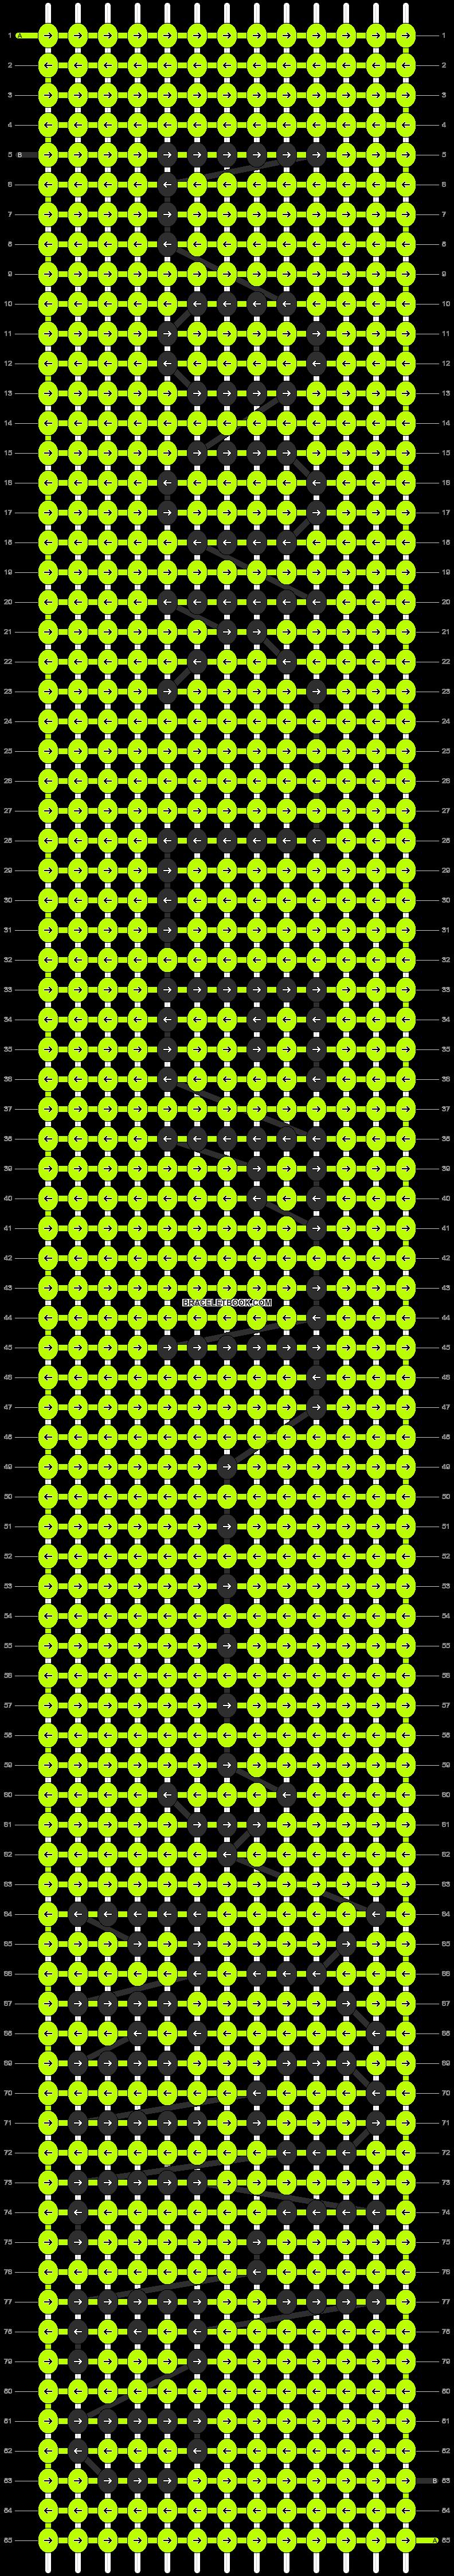 Alpha pattern #16732 pattern